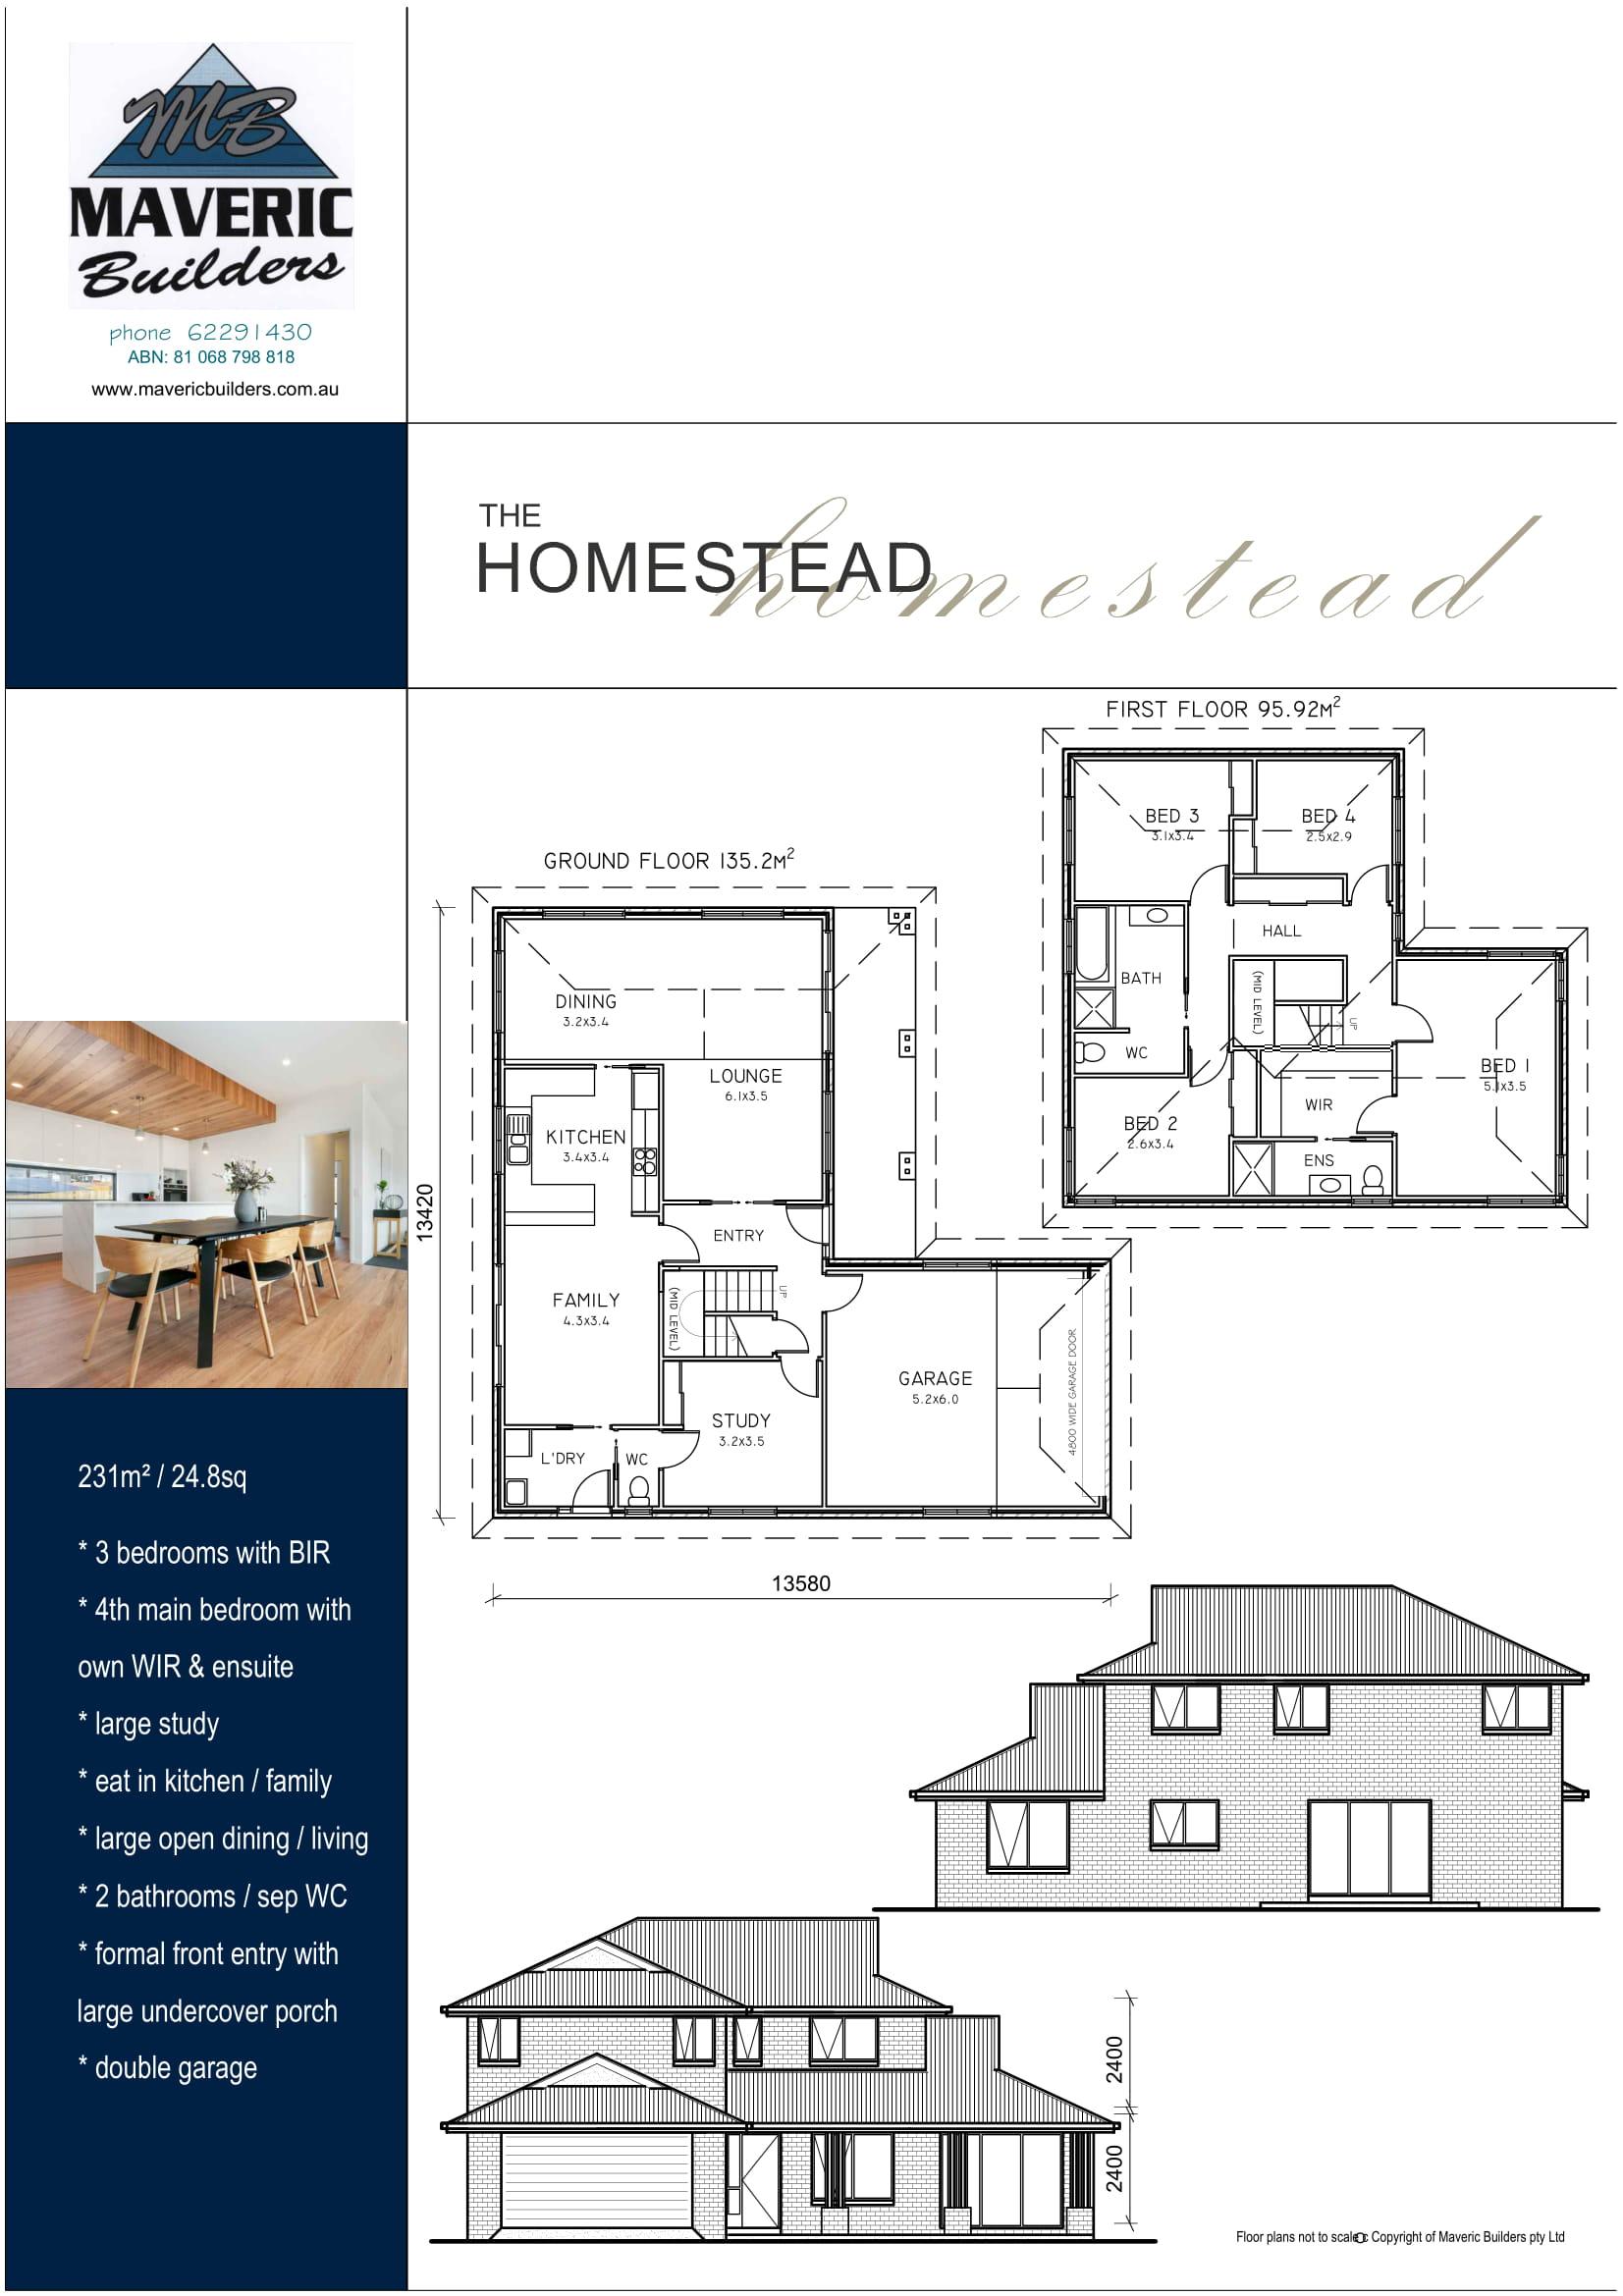 A4 Brochures 2019 01 - 24-23.jpg